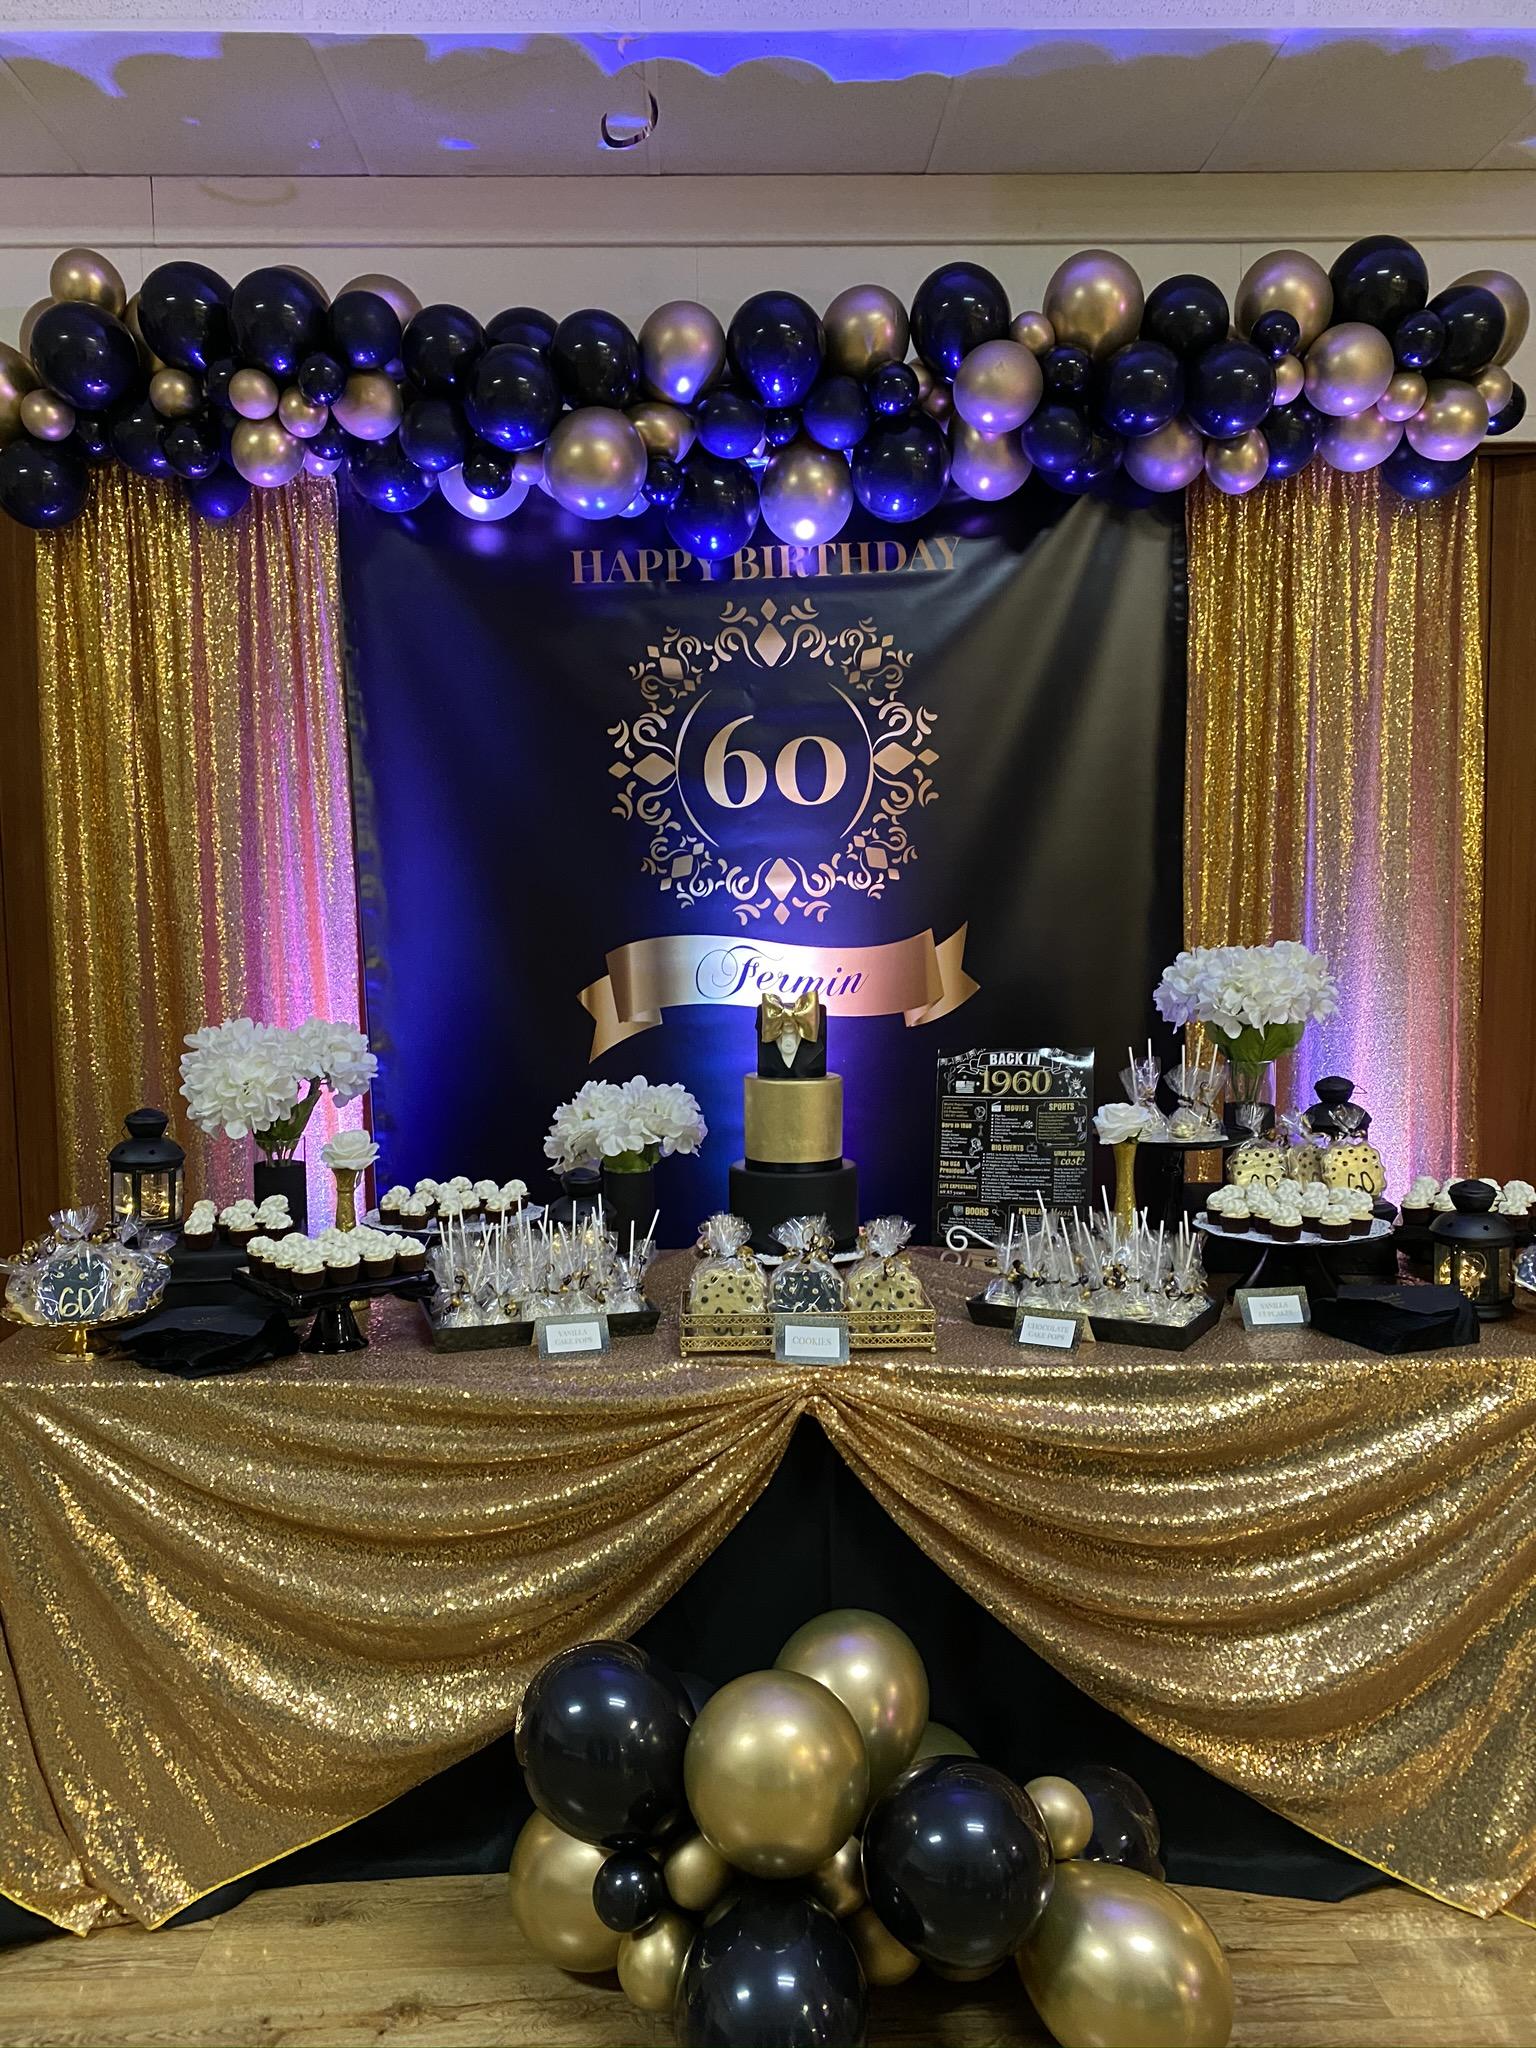 Sarsie's Parties 01-25-20 Black & Gold 60th Birthday Party